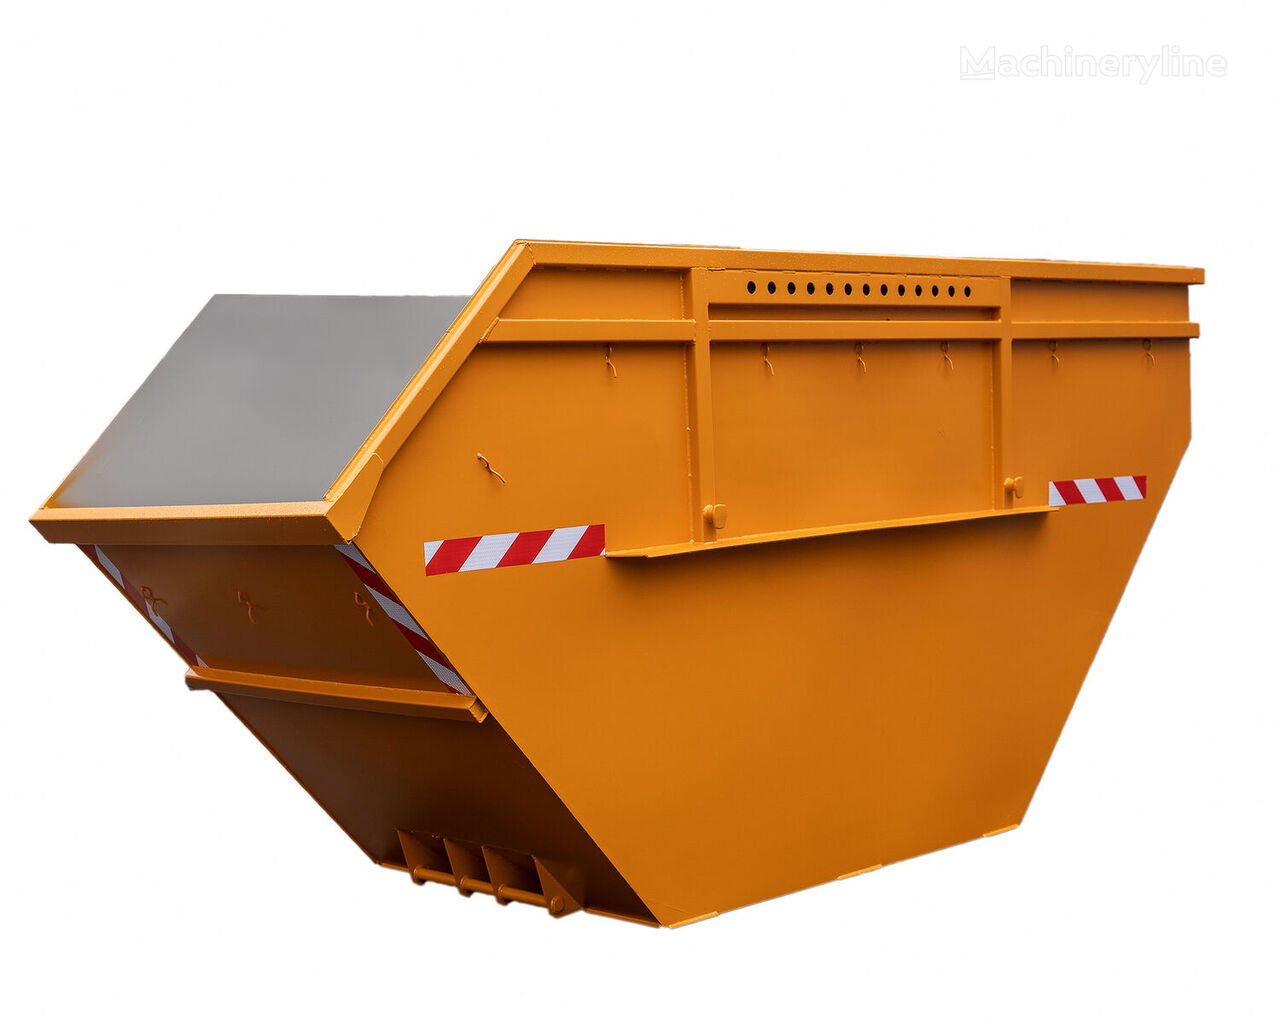 naujas statybinių atliekų konteineris Absetzcontainer Absetzmulde Mulde Container Kontener Mulda